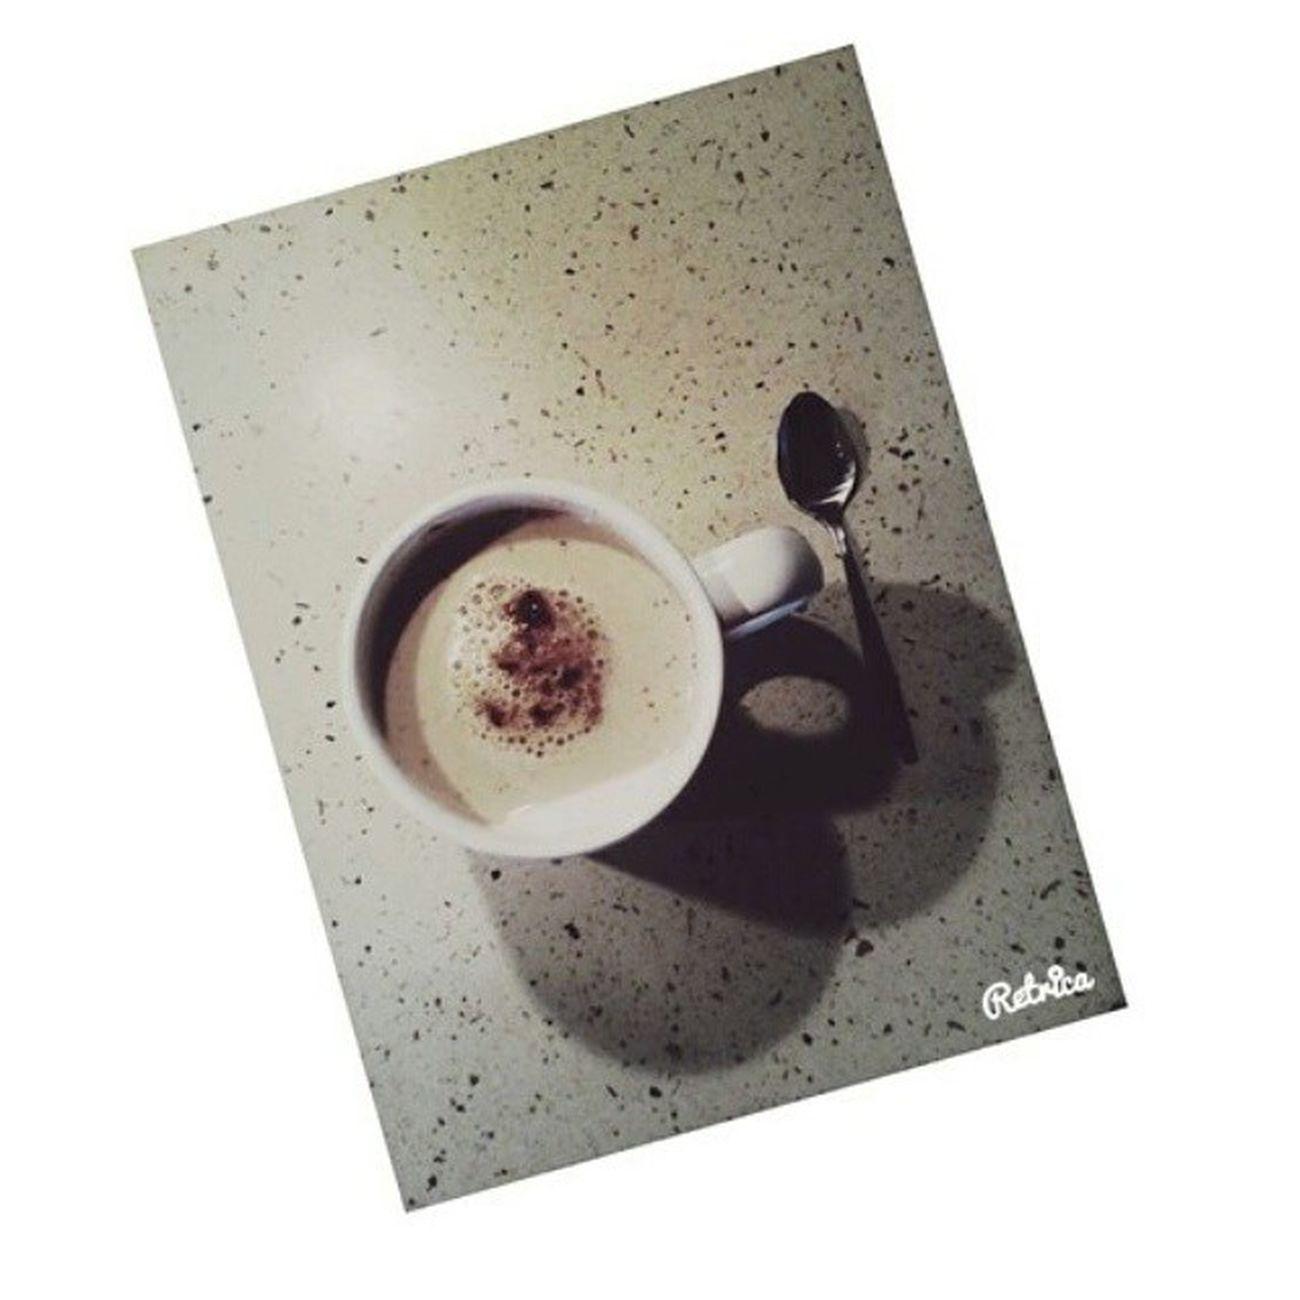 Good Days Start With Coffee ♡ Coffee Cafe Instacoffee Tagsforlikes .com Cafelife Caffeine Hot Mug Drink Coffeeaddict Coffeegram Coffeeoftheday Cotd Coffeelover Coffeelovers Coffeeholic Coffiecup Coffeelove Coffeemug TagsForLikesApp Coffeeholic Coffeelife